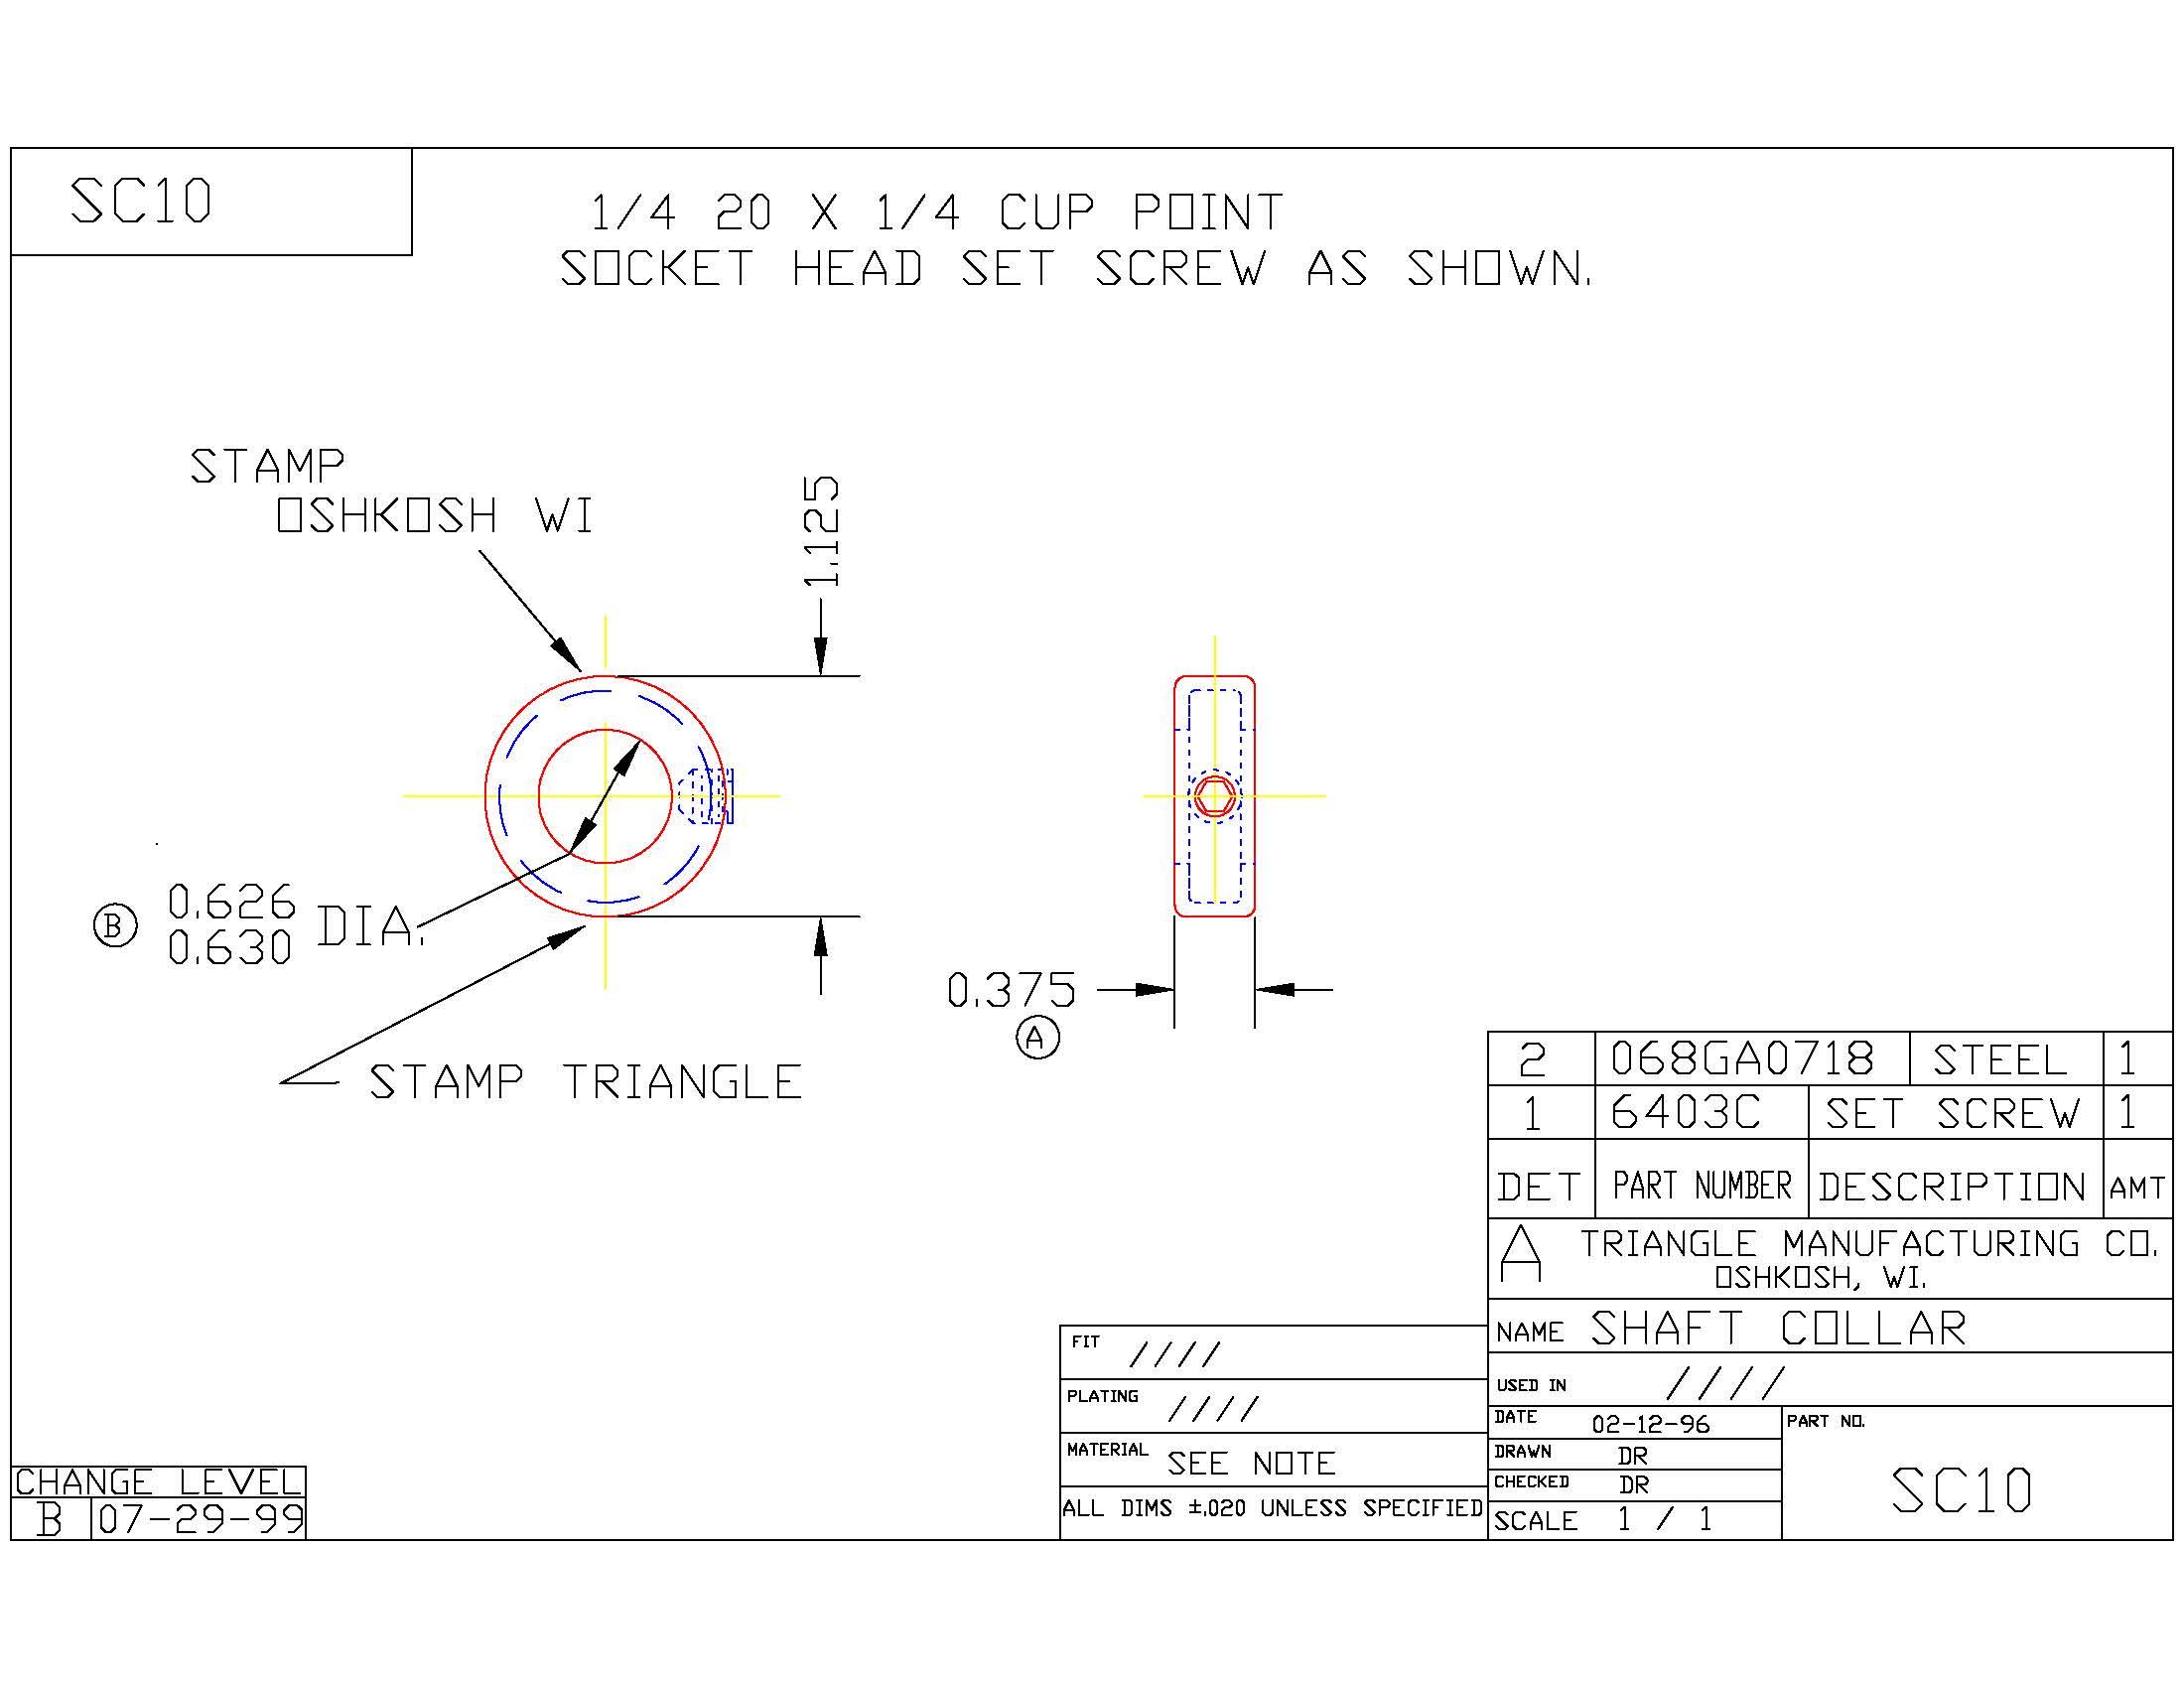 Set Screw Shaft Collar SC10